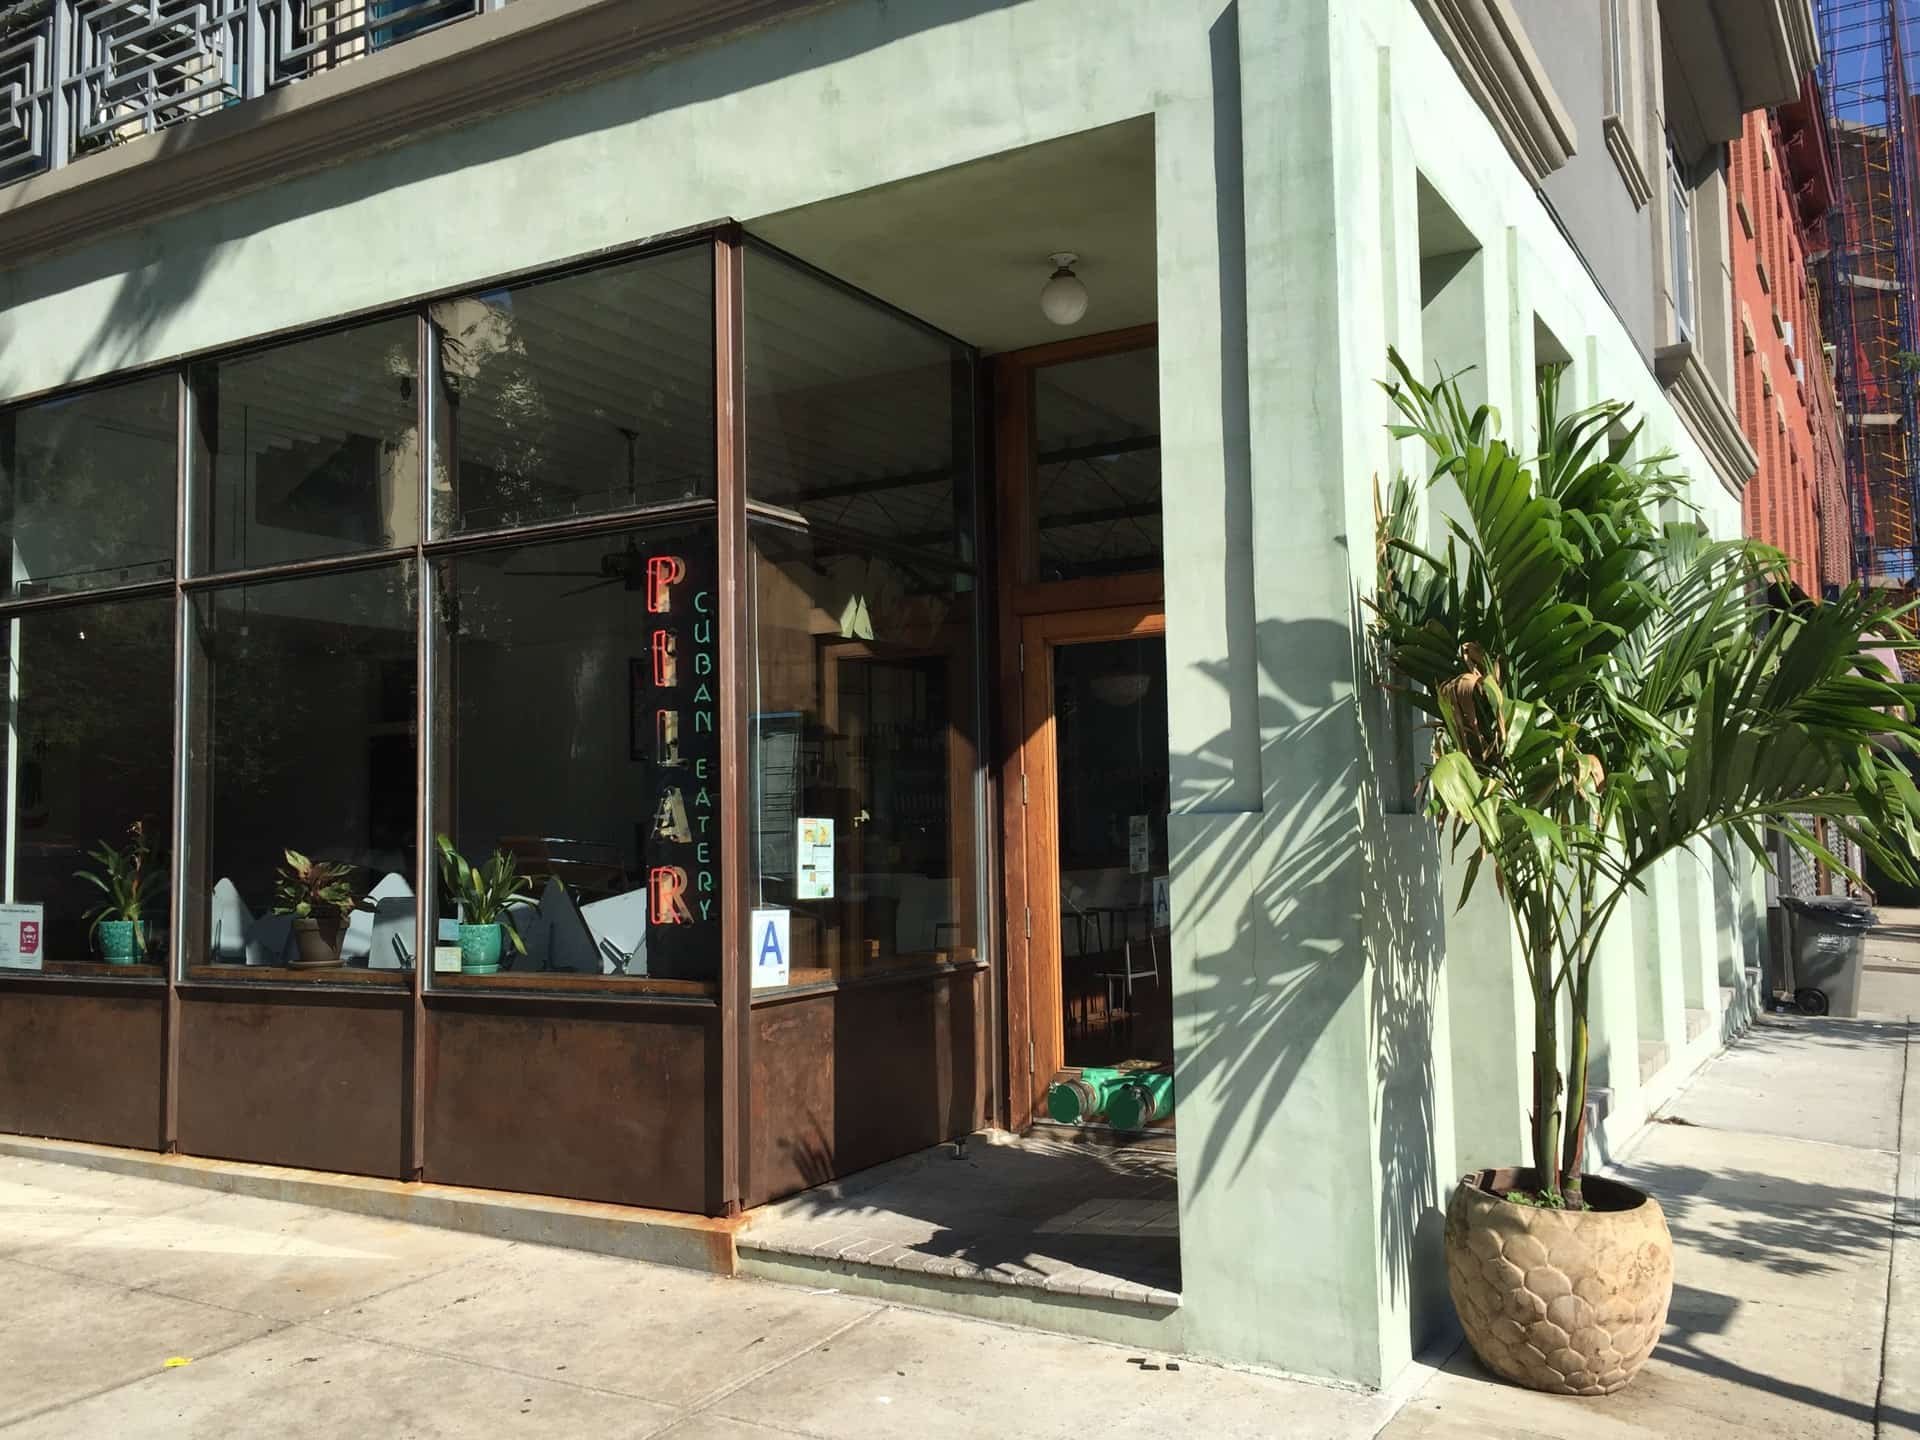 Brooklyn Suites Bedford-Stuyvesant Neighborhood – Lafayette Ave